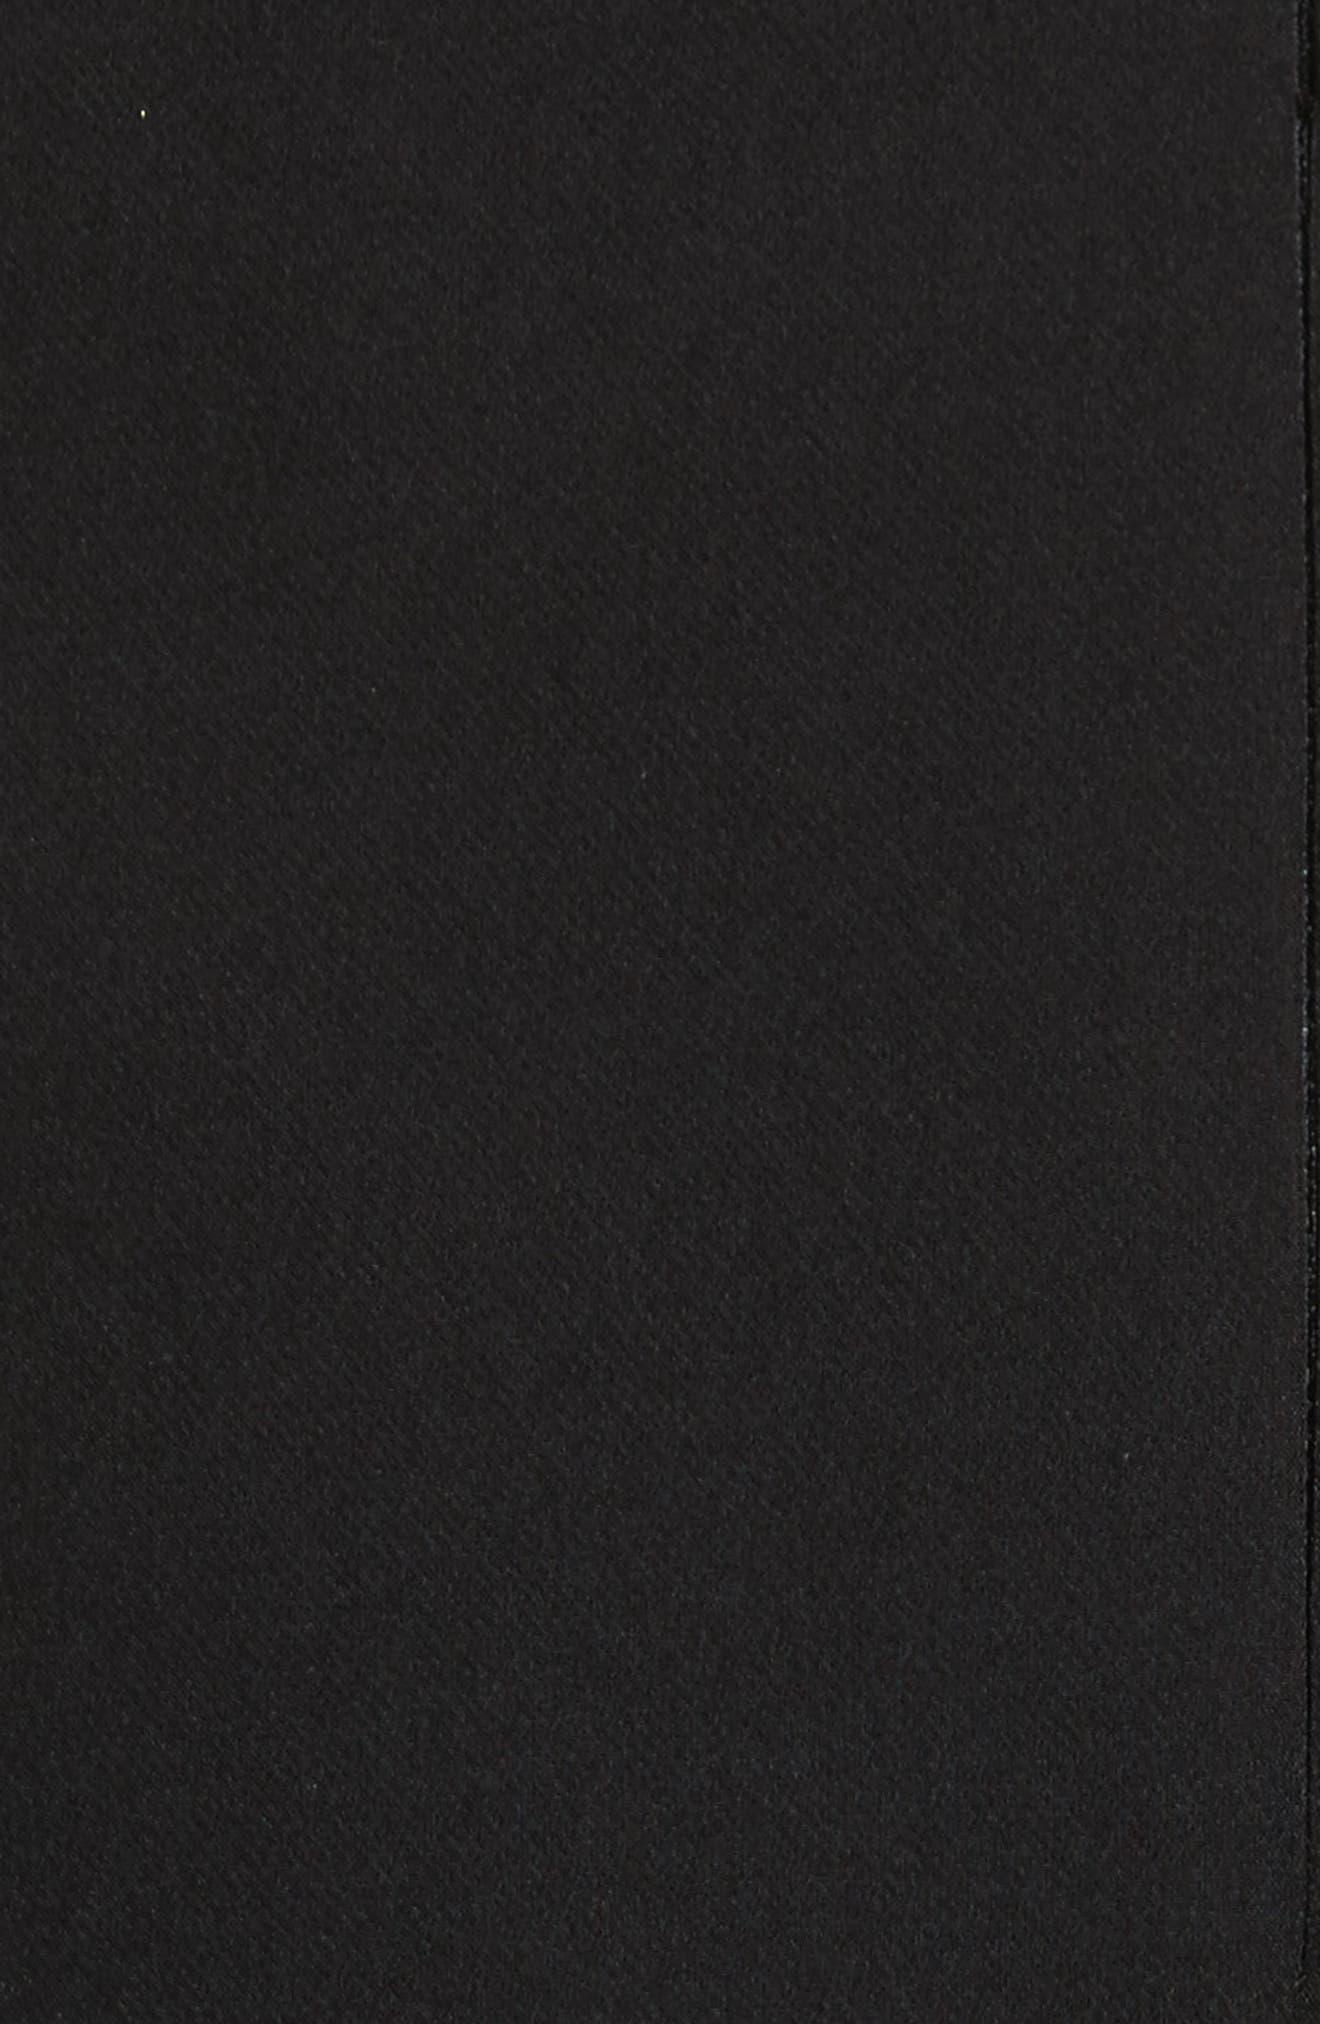 Brie Off the Shoulder Italian Cady Dress,                             Alternate thumbnail 5, color,                             Black